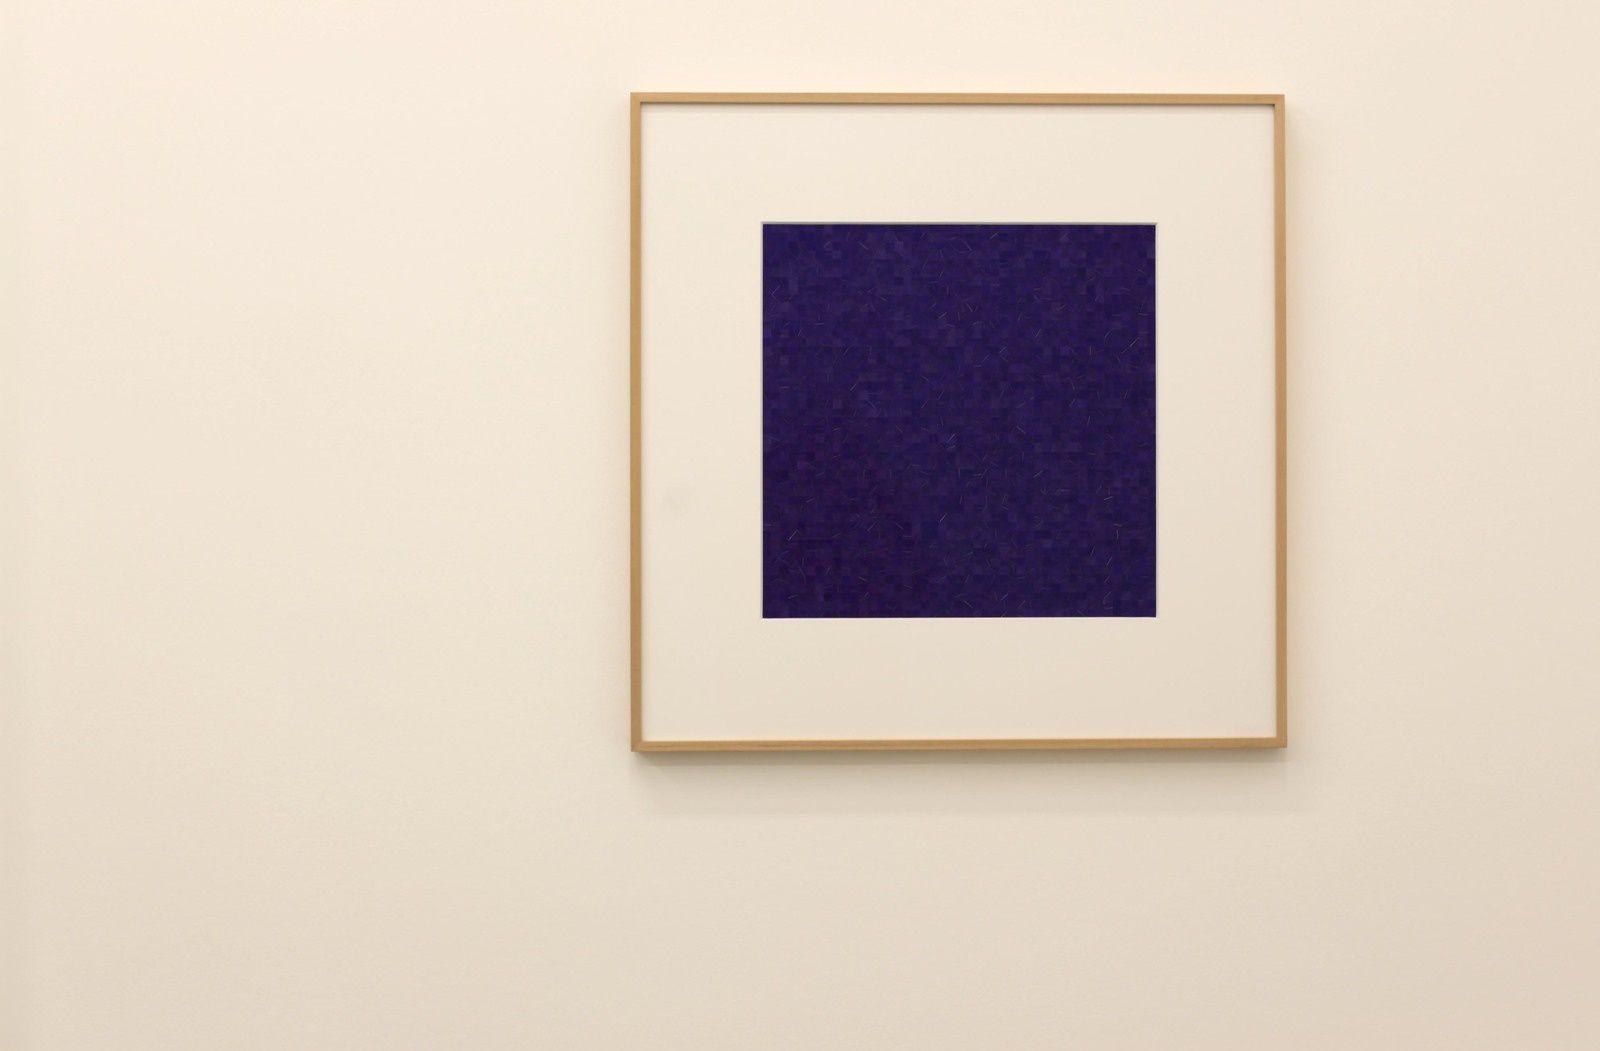 """2,025 II"", 2019 de Gabriel DE LA MORA - Courtesy Galerie Perrotin © Photo Éric Simon"